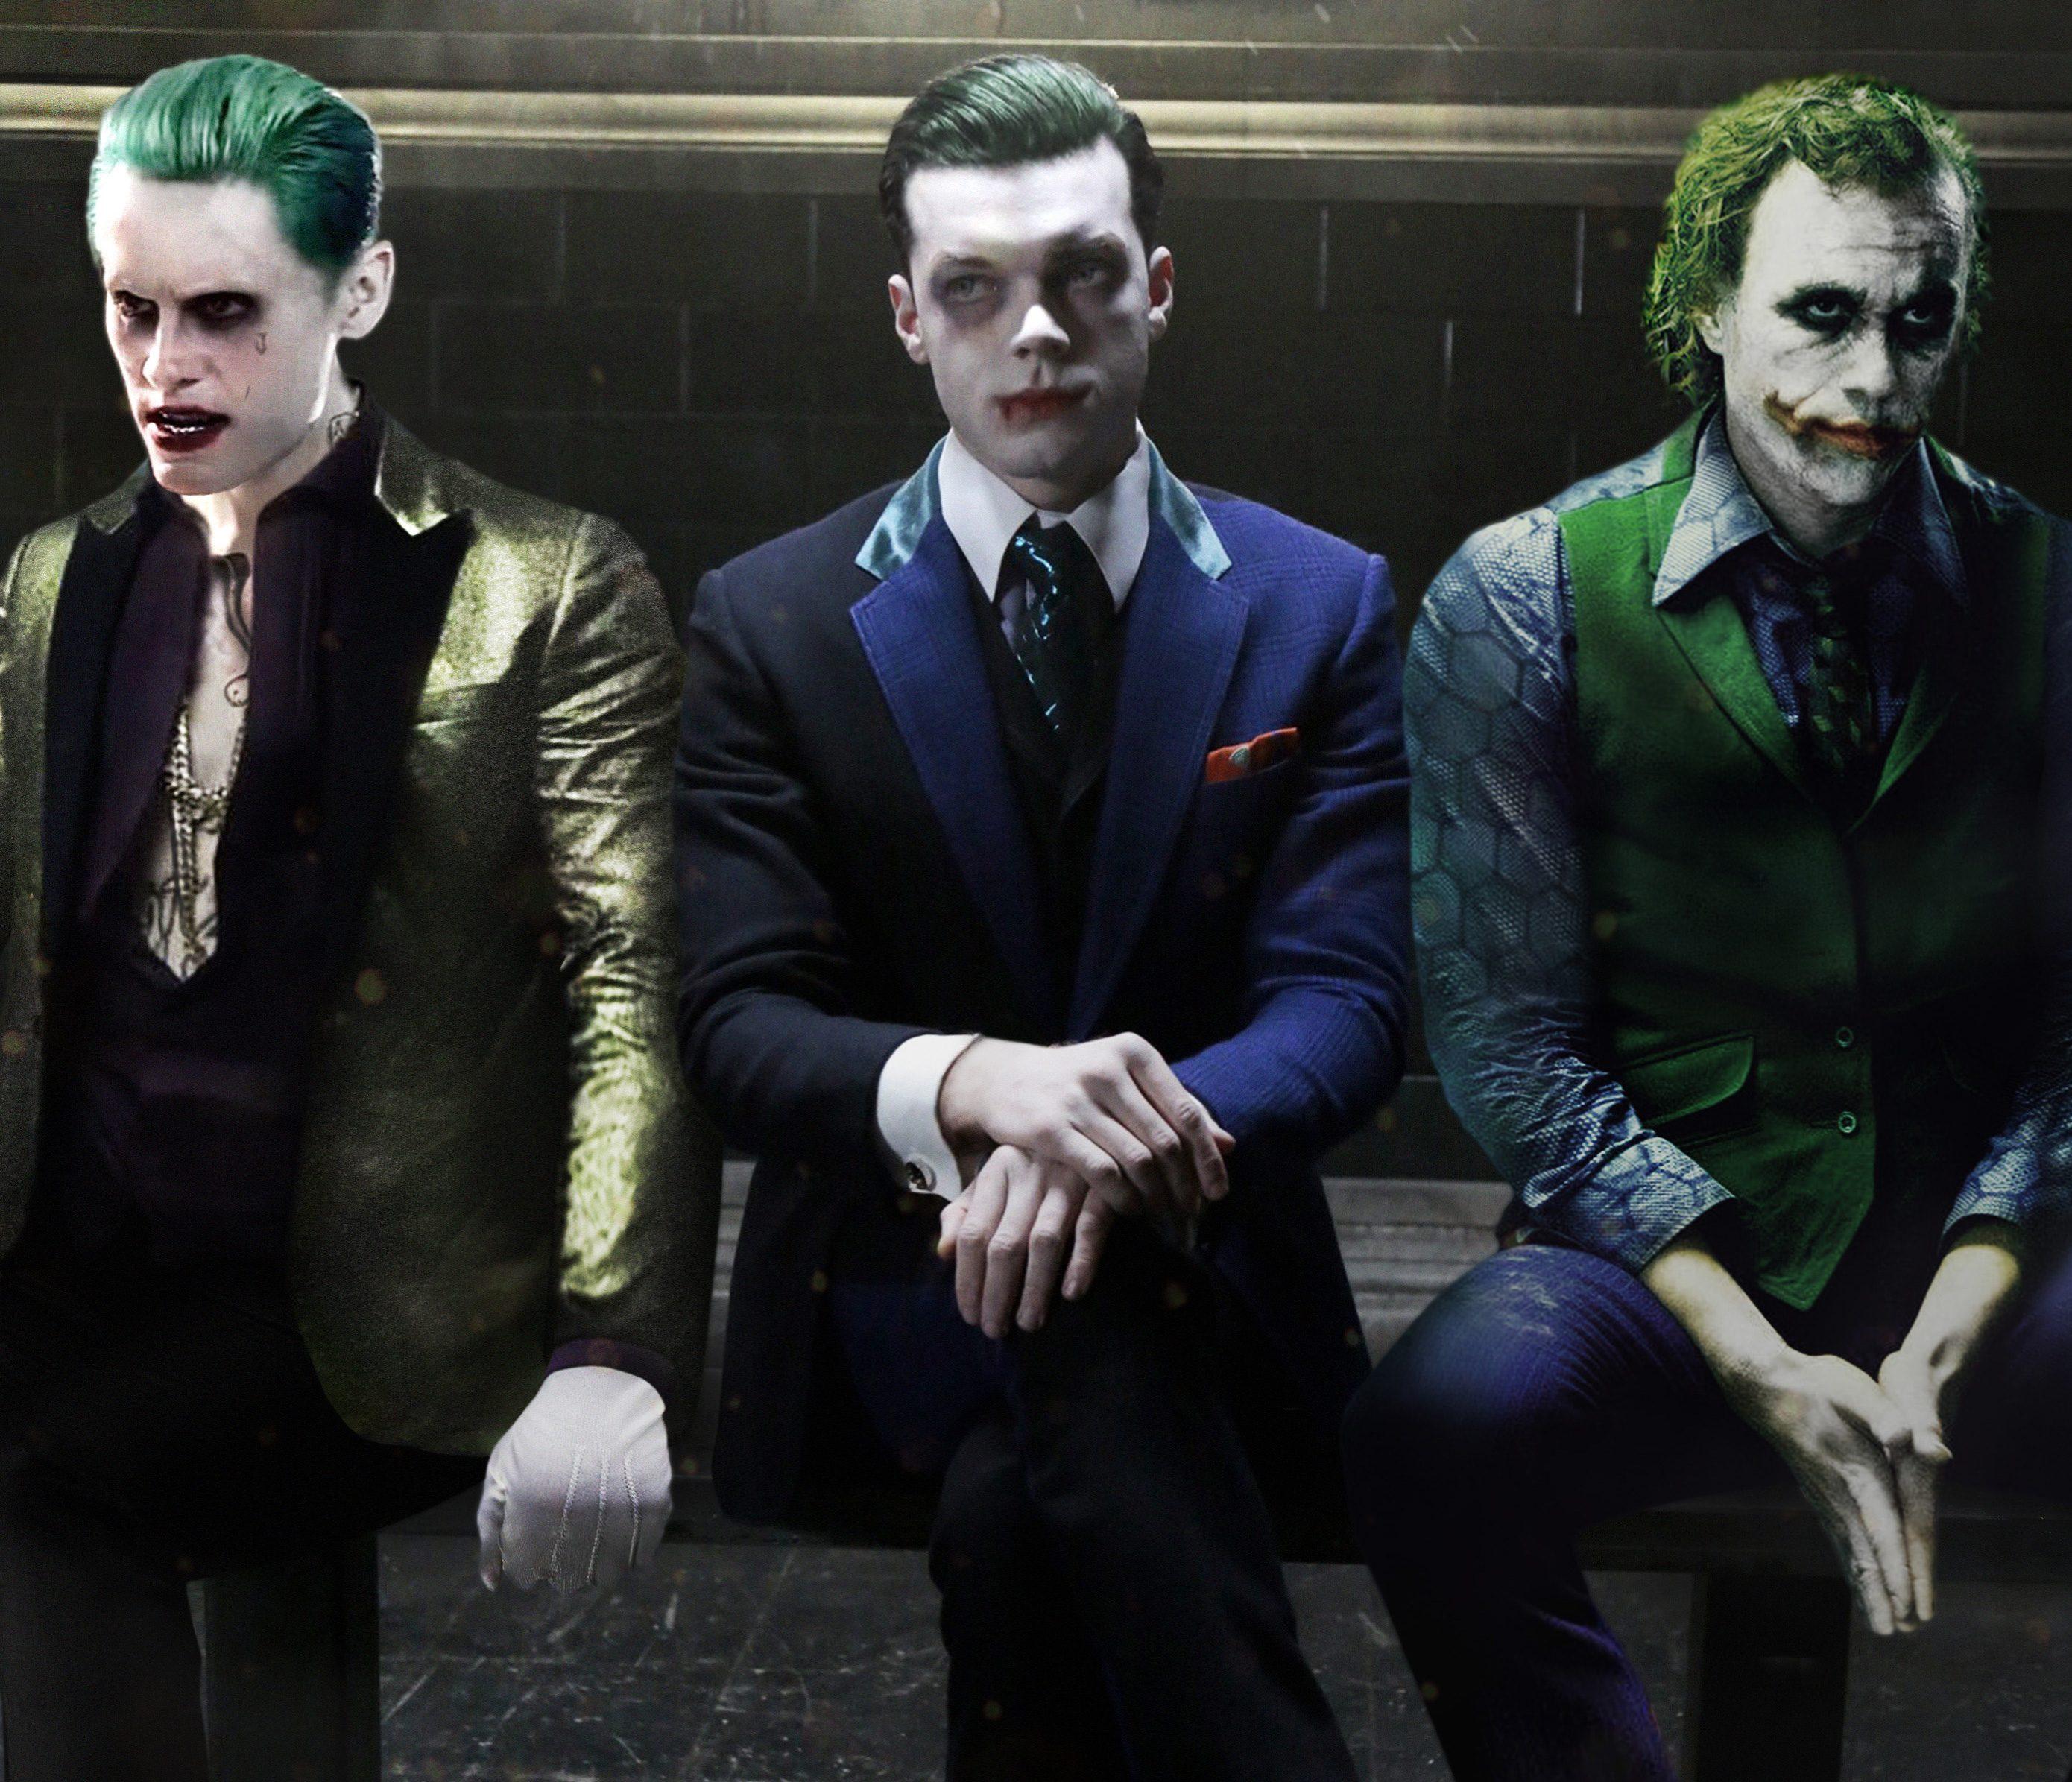 Jared Leto Joker Wallpaper Iphone 6 Labzada